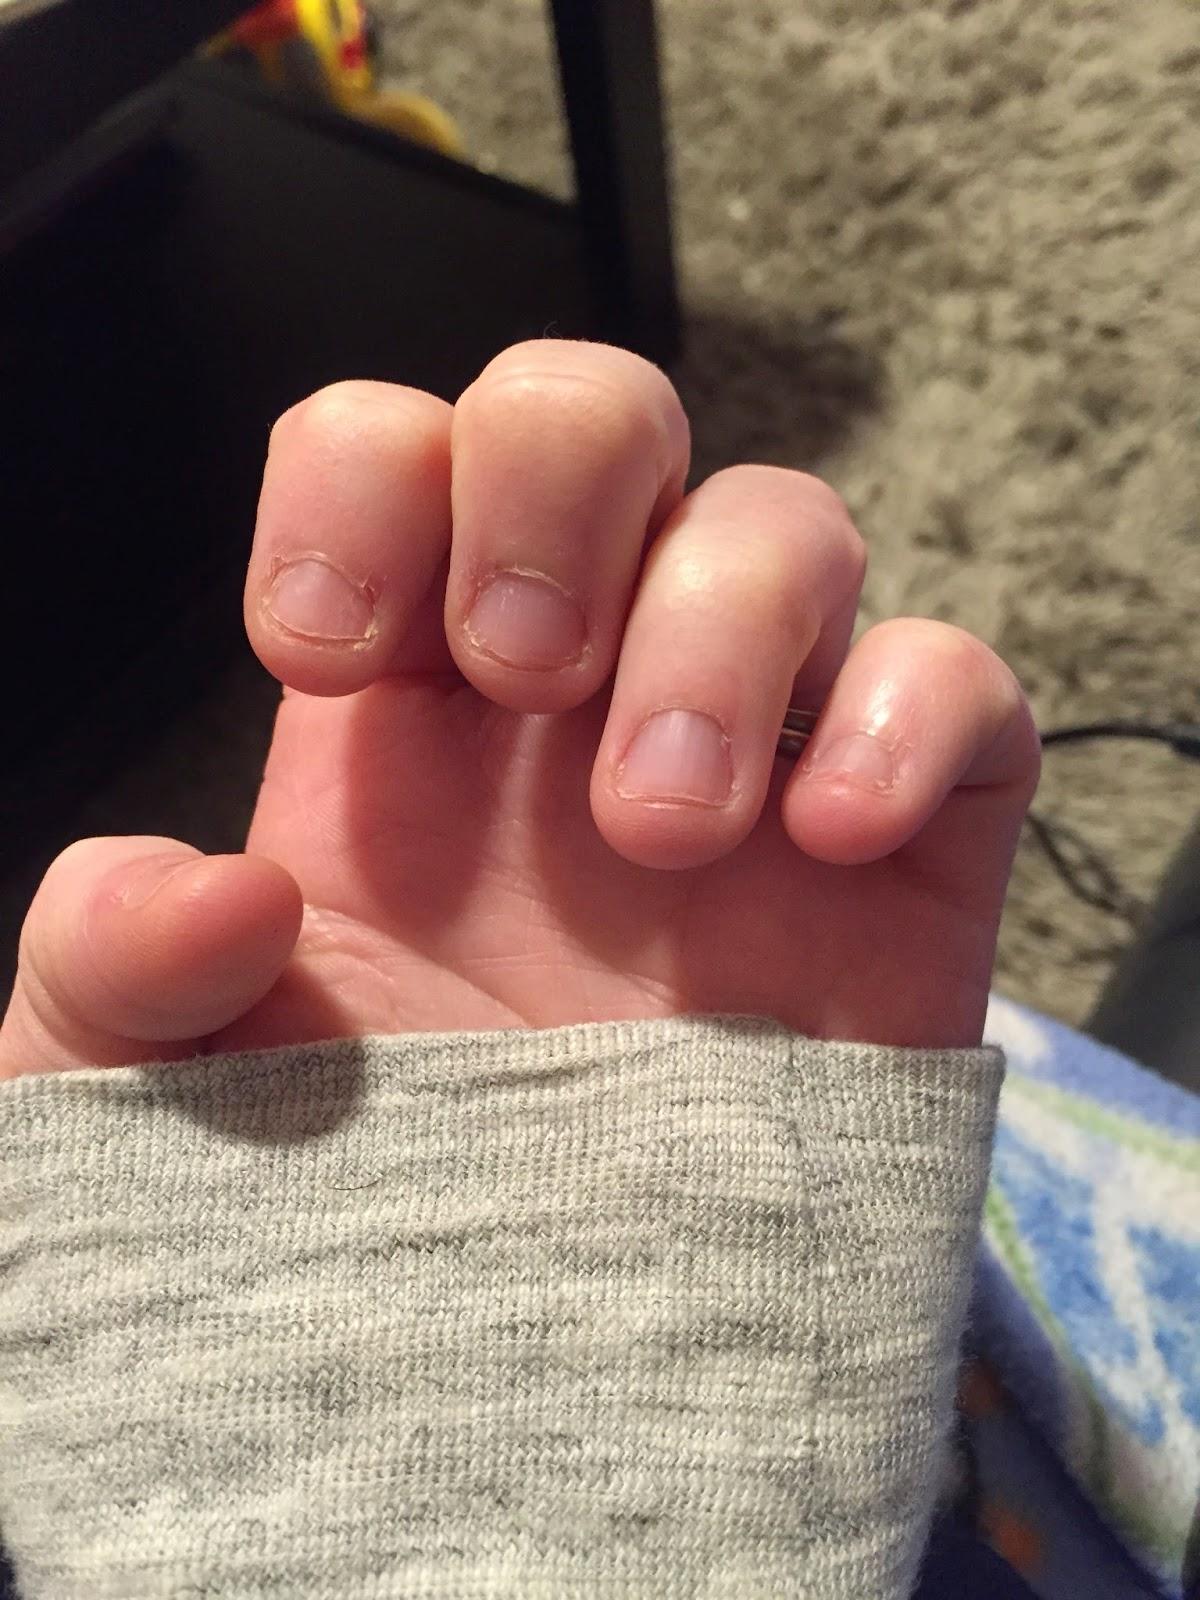 A Healthier Me Week 1: Stop Biting my Nails! - My Mini Adventurer